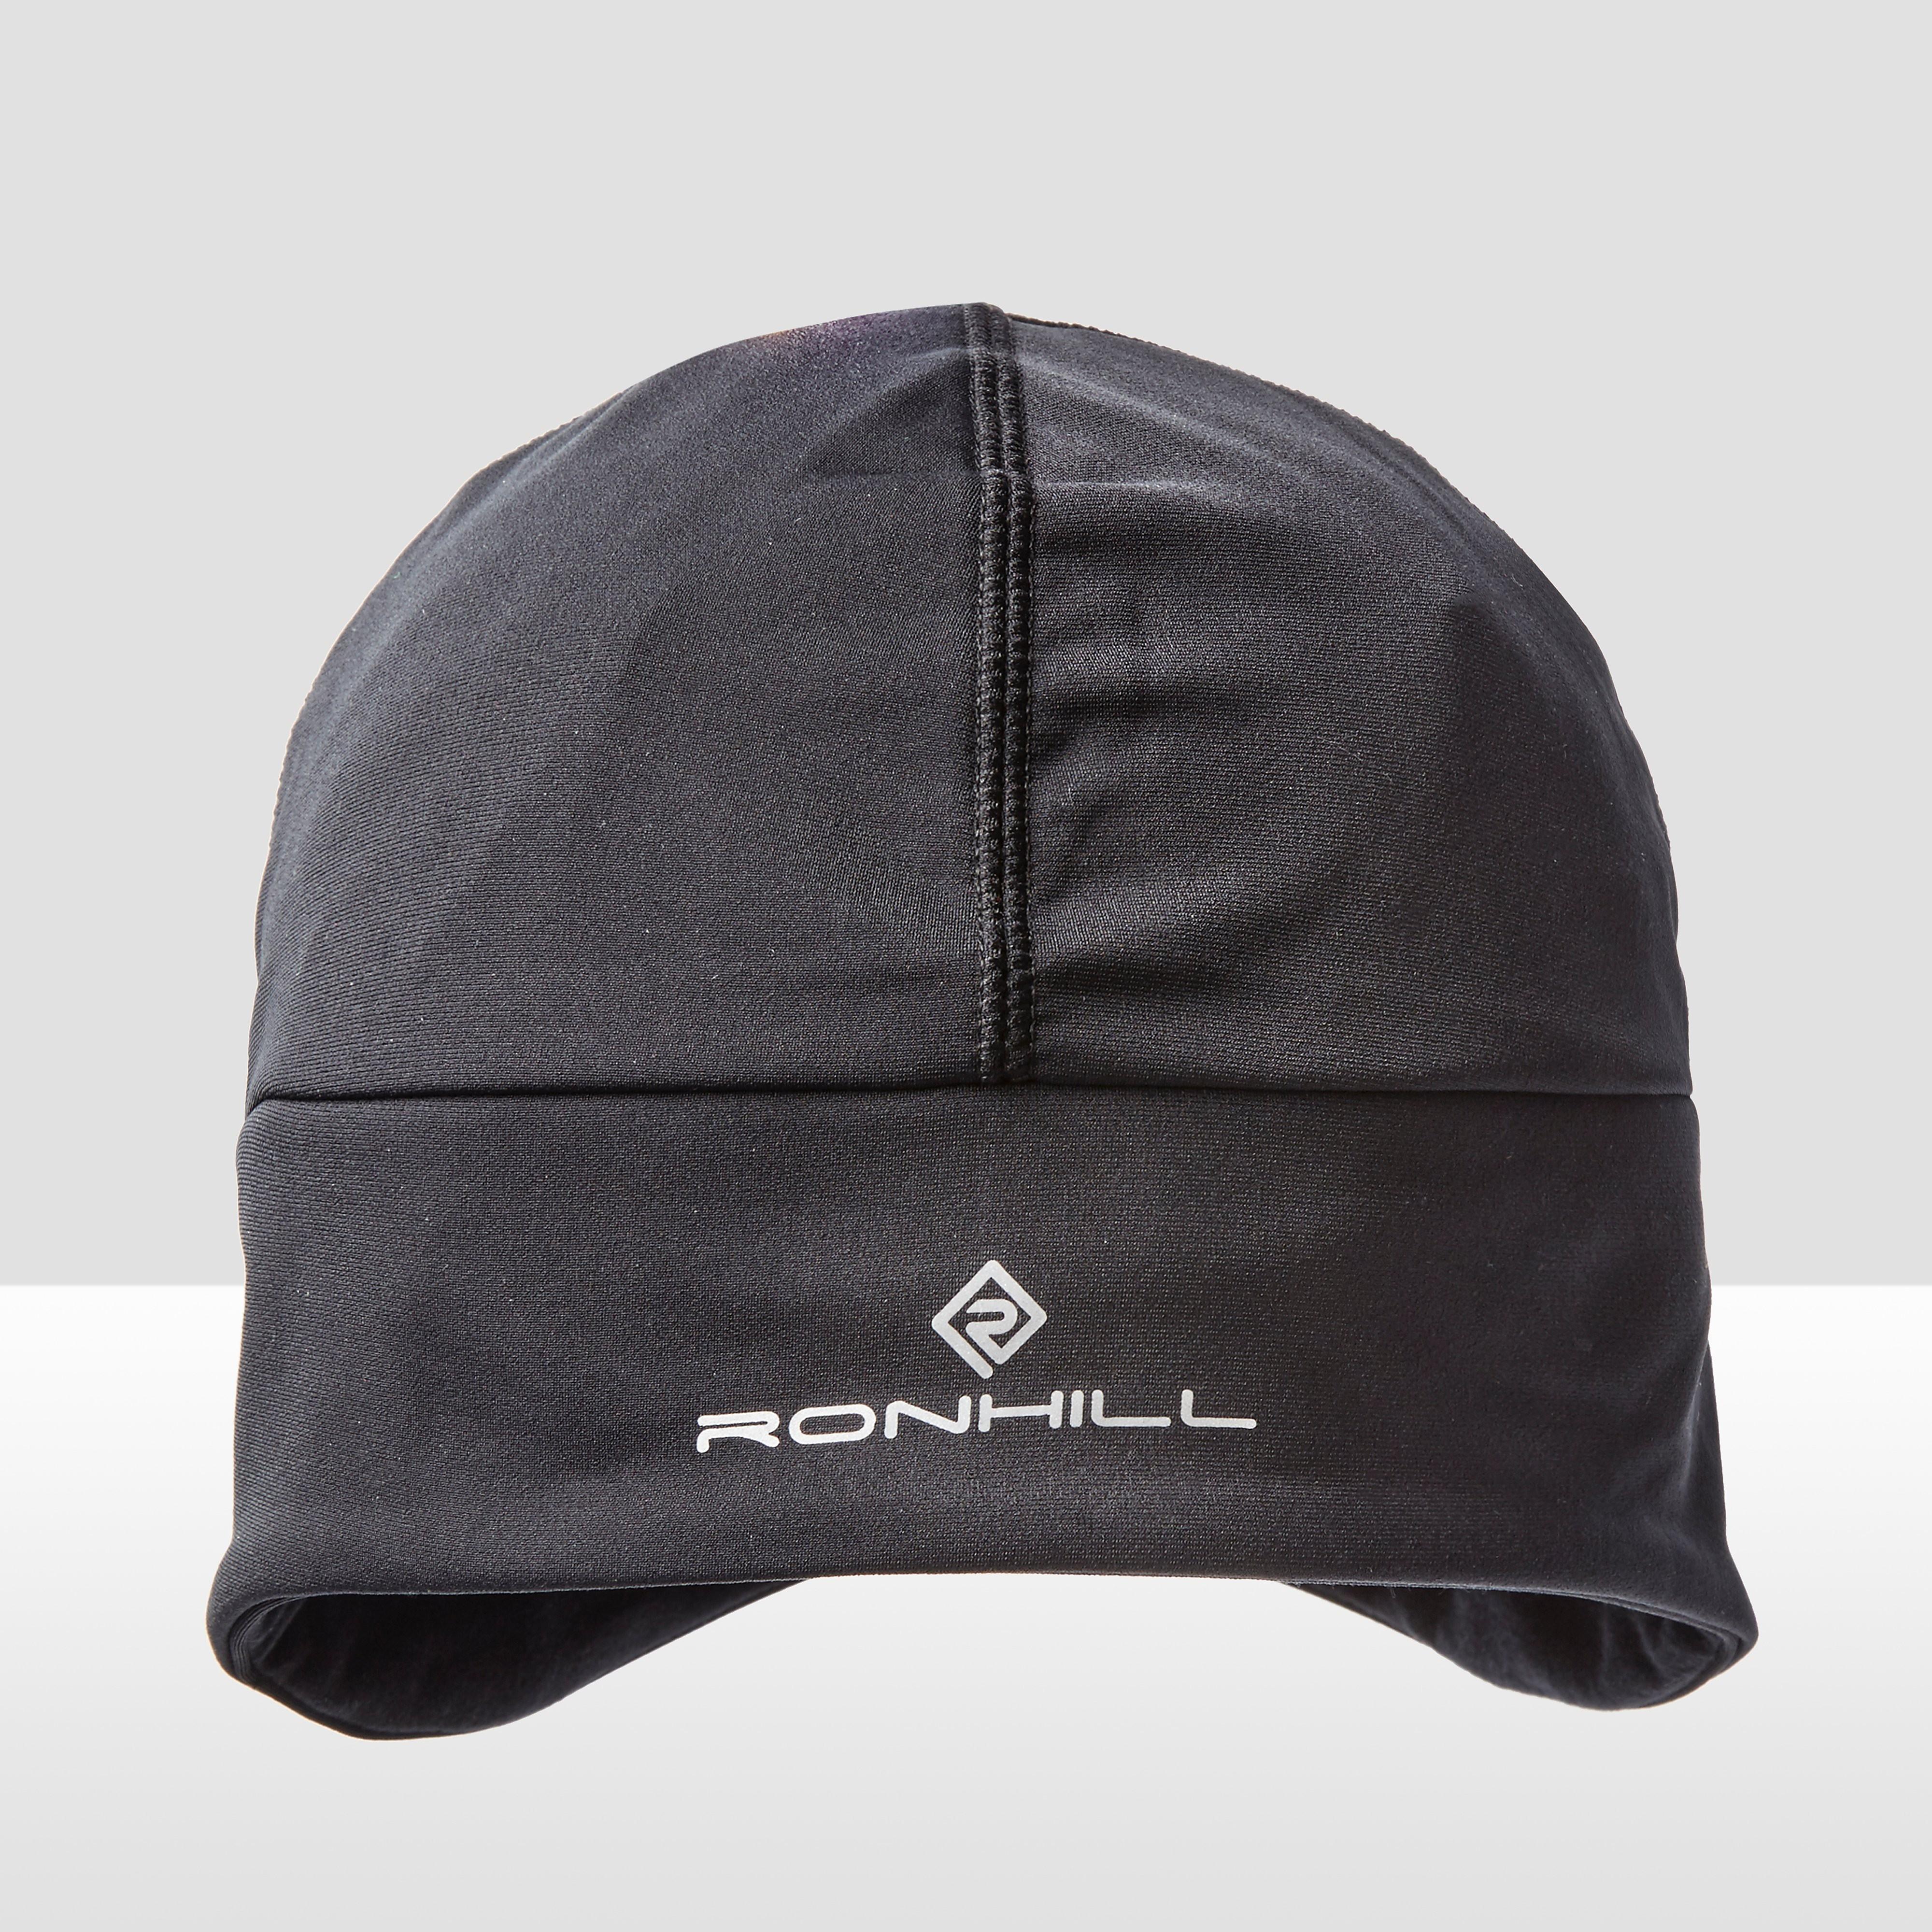 Ronhill Pro Beanie